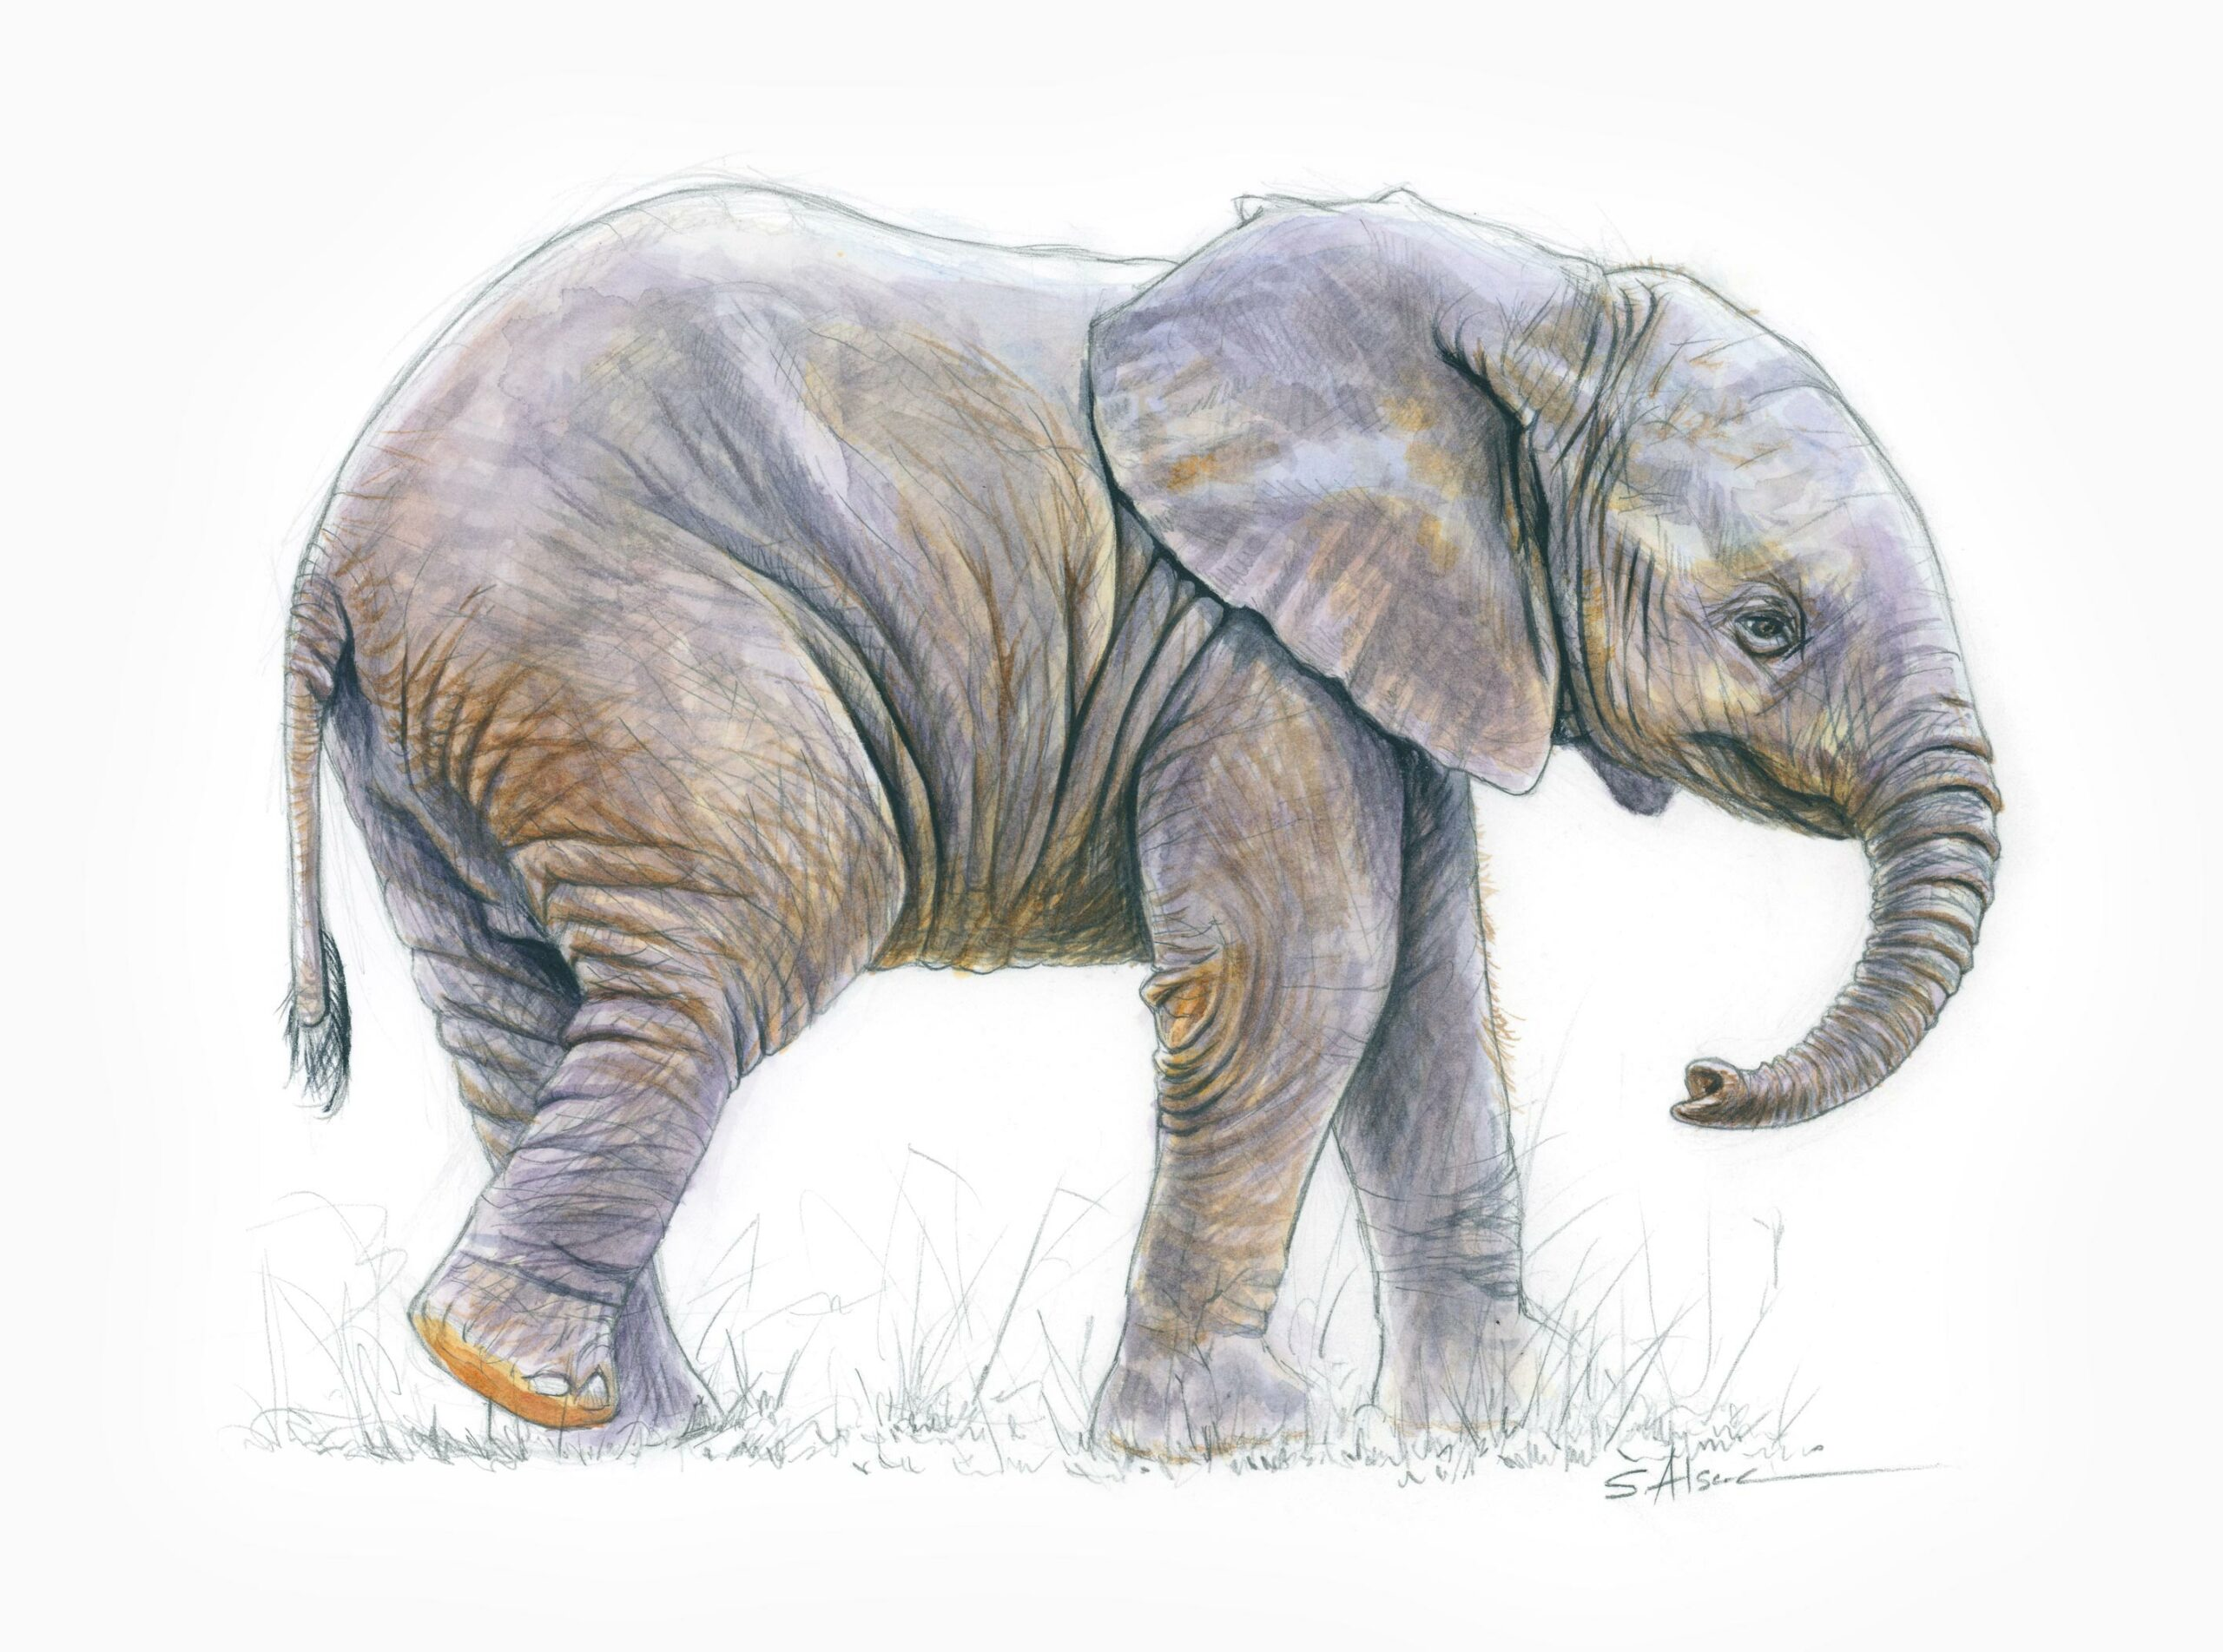 Stephane Alsac Artiste Animalier Wildlife Artist